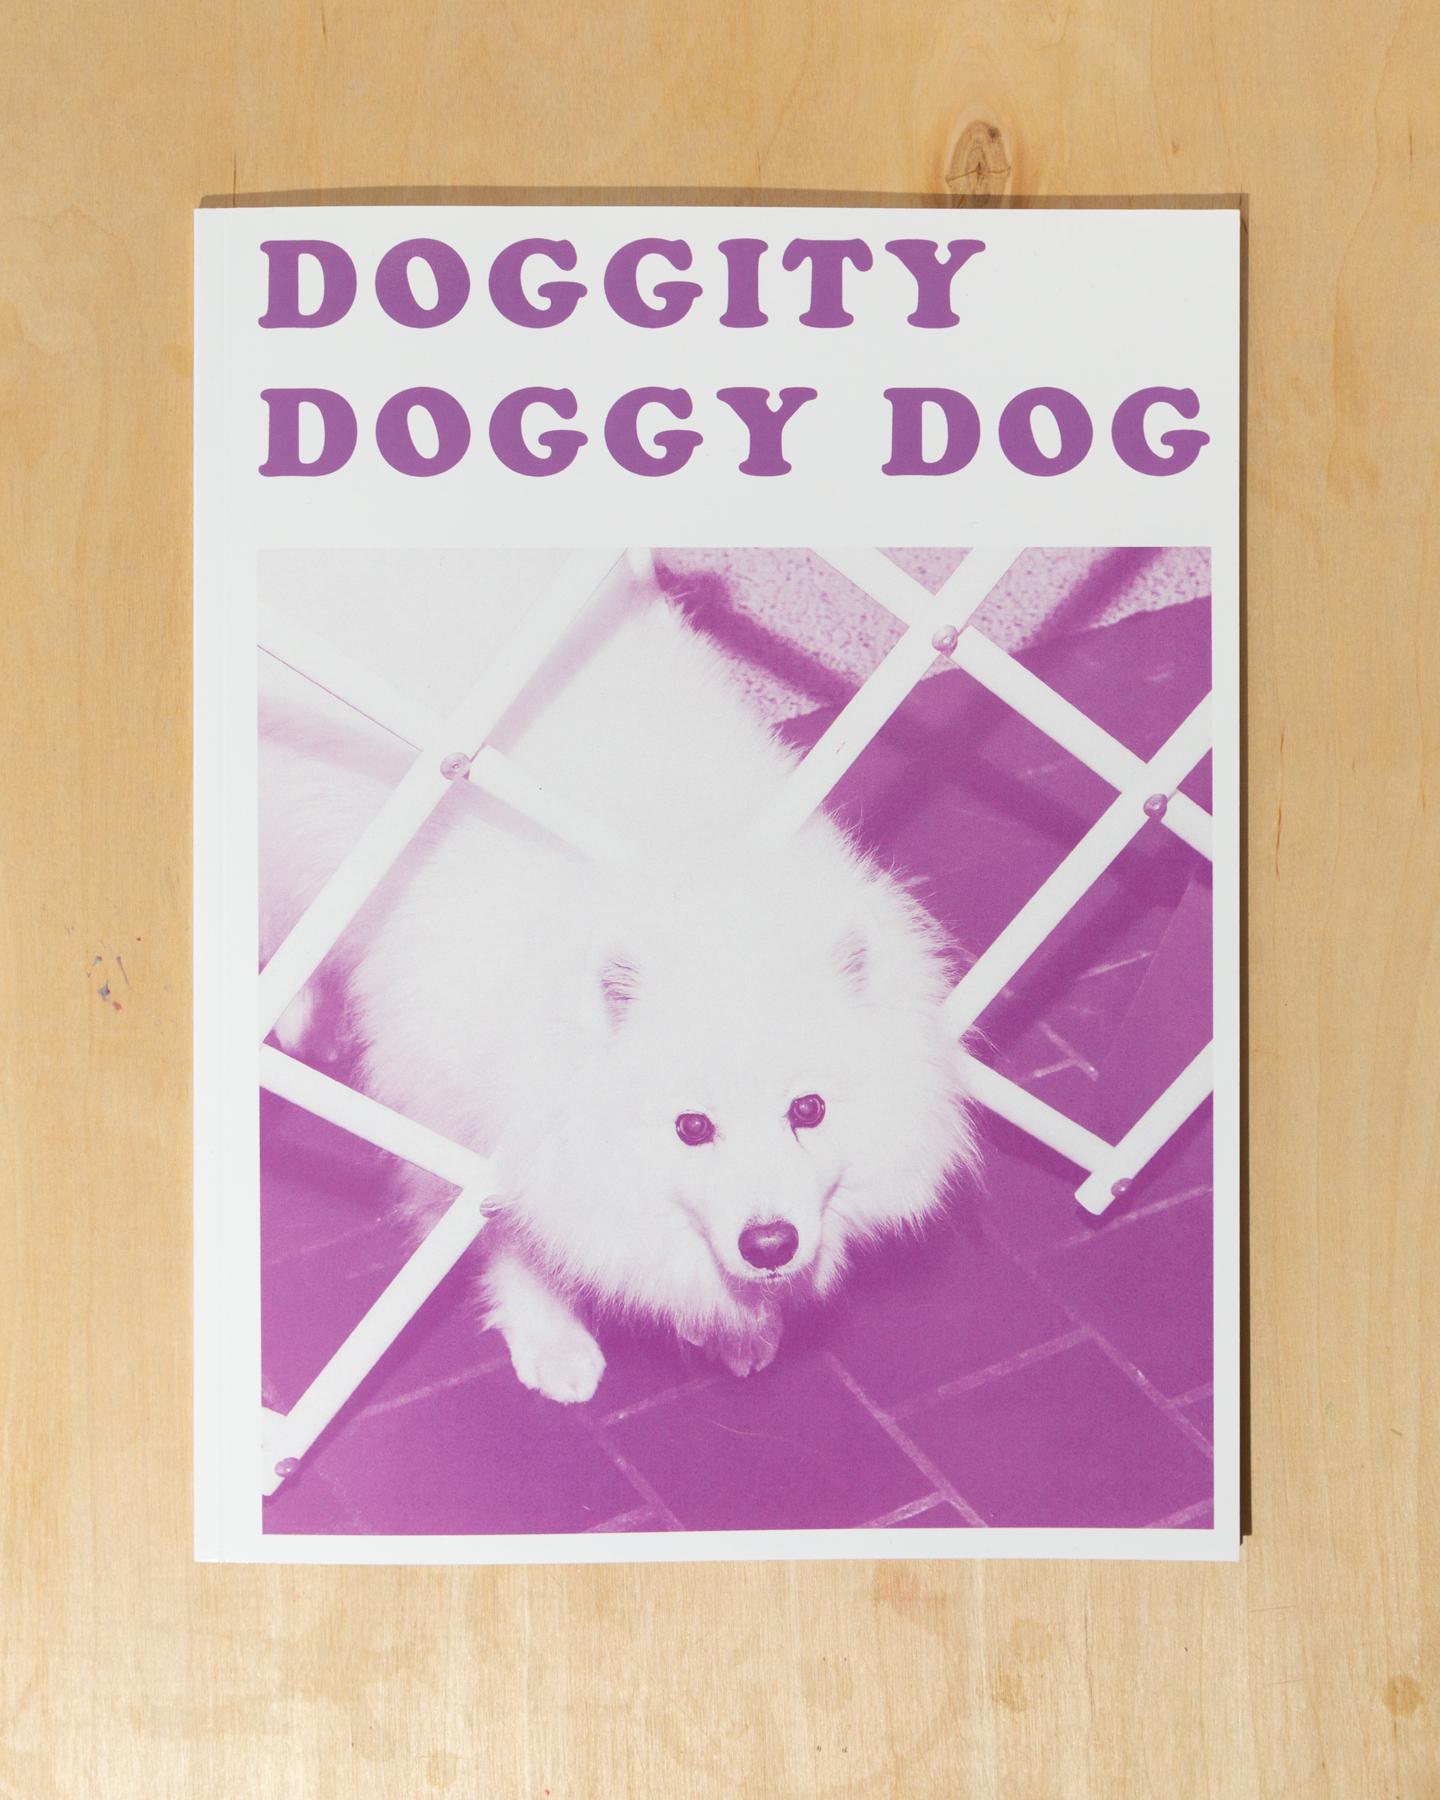 Doggity Doggy Dog